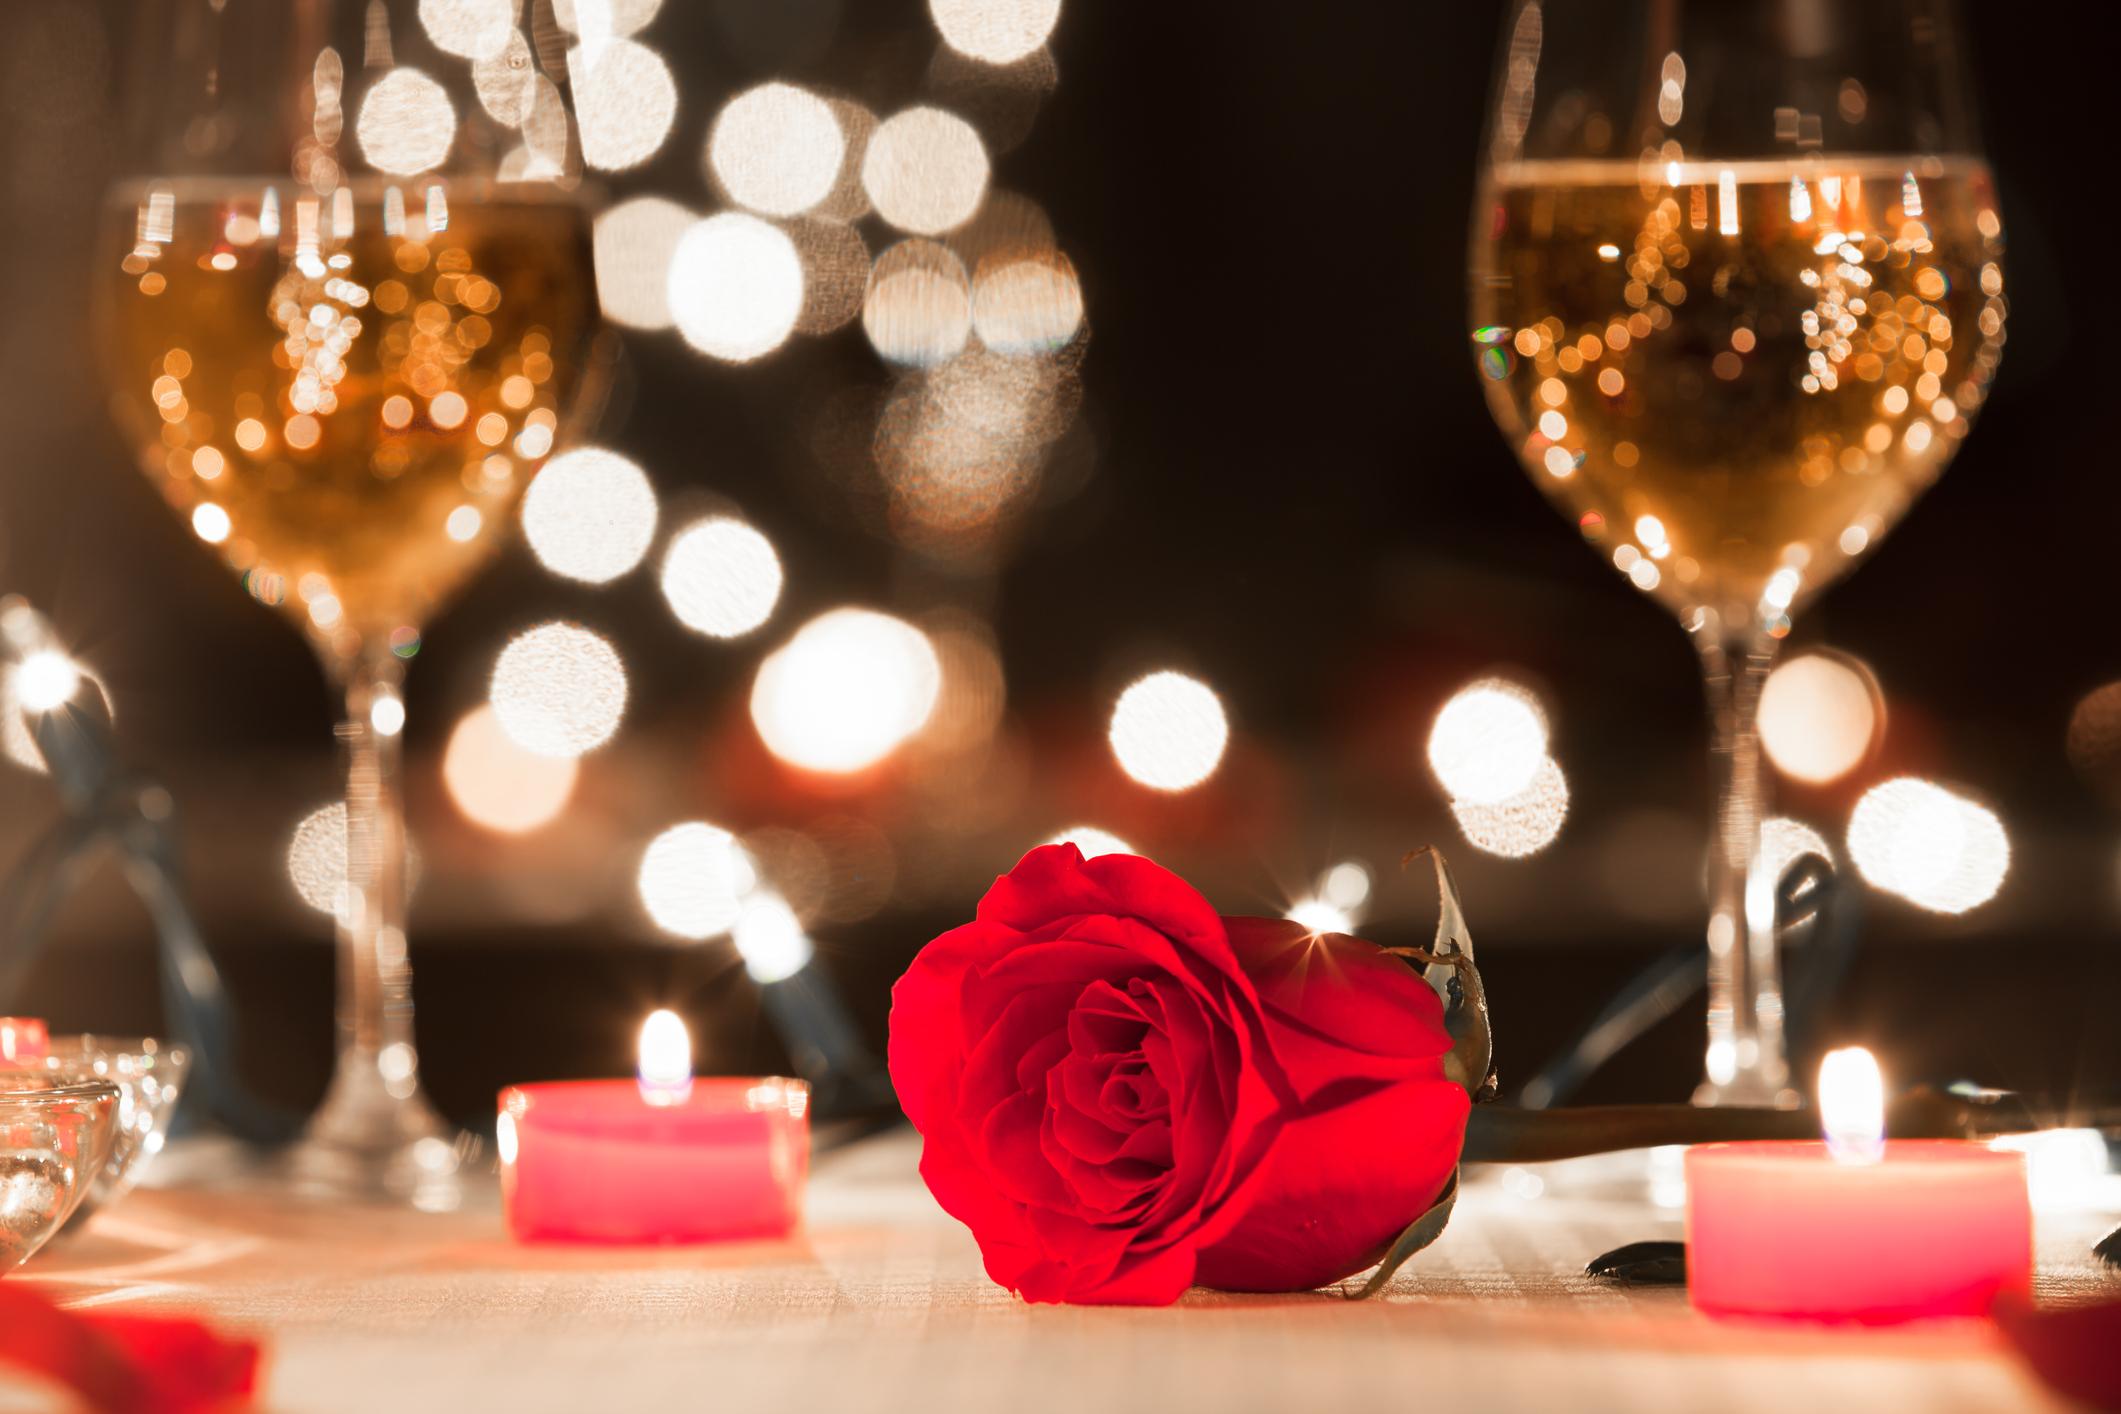 Romantic candlelight dinner in luxury restaurant